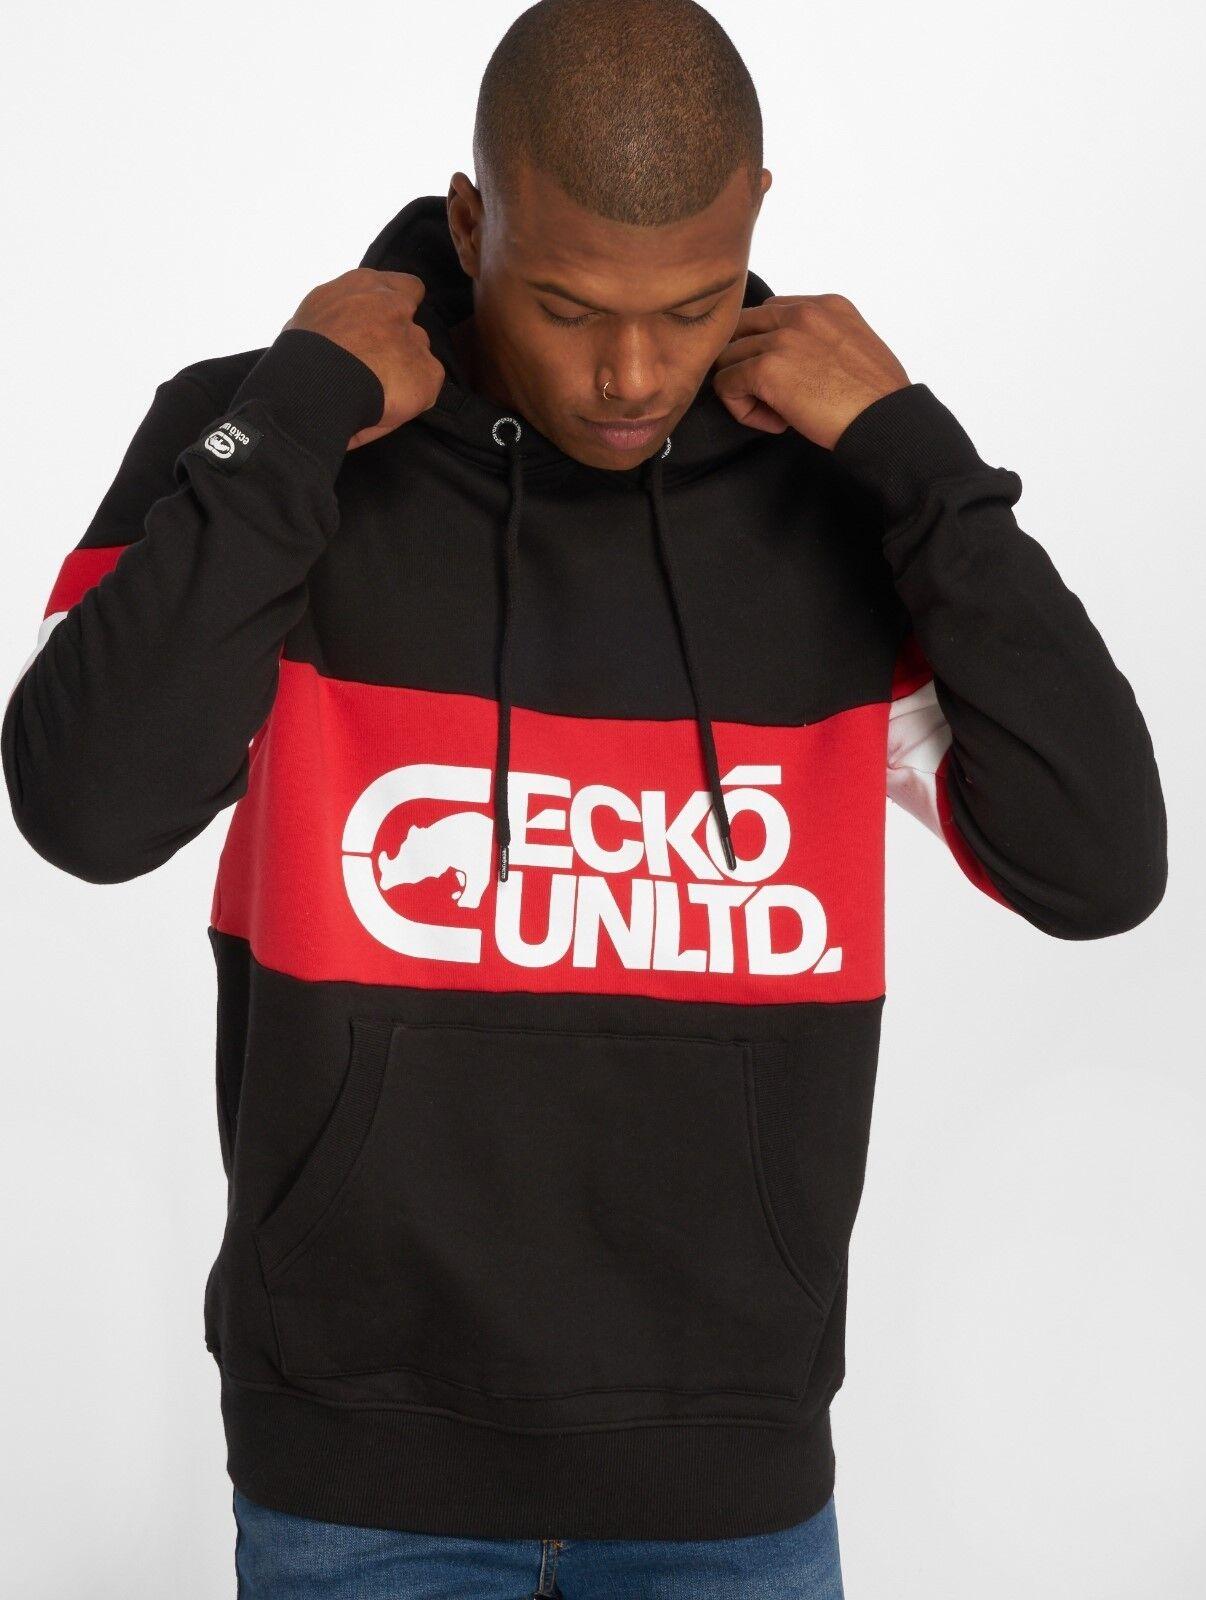 Ecko Unltd. Hoodie Flagship Pullover Größe S - 3XL Oldschool Hip Hop Streetwear